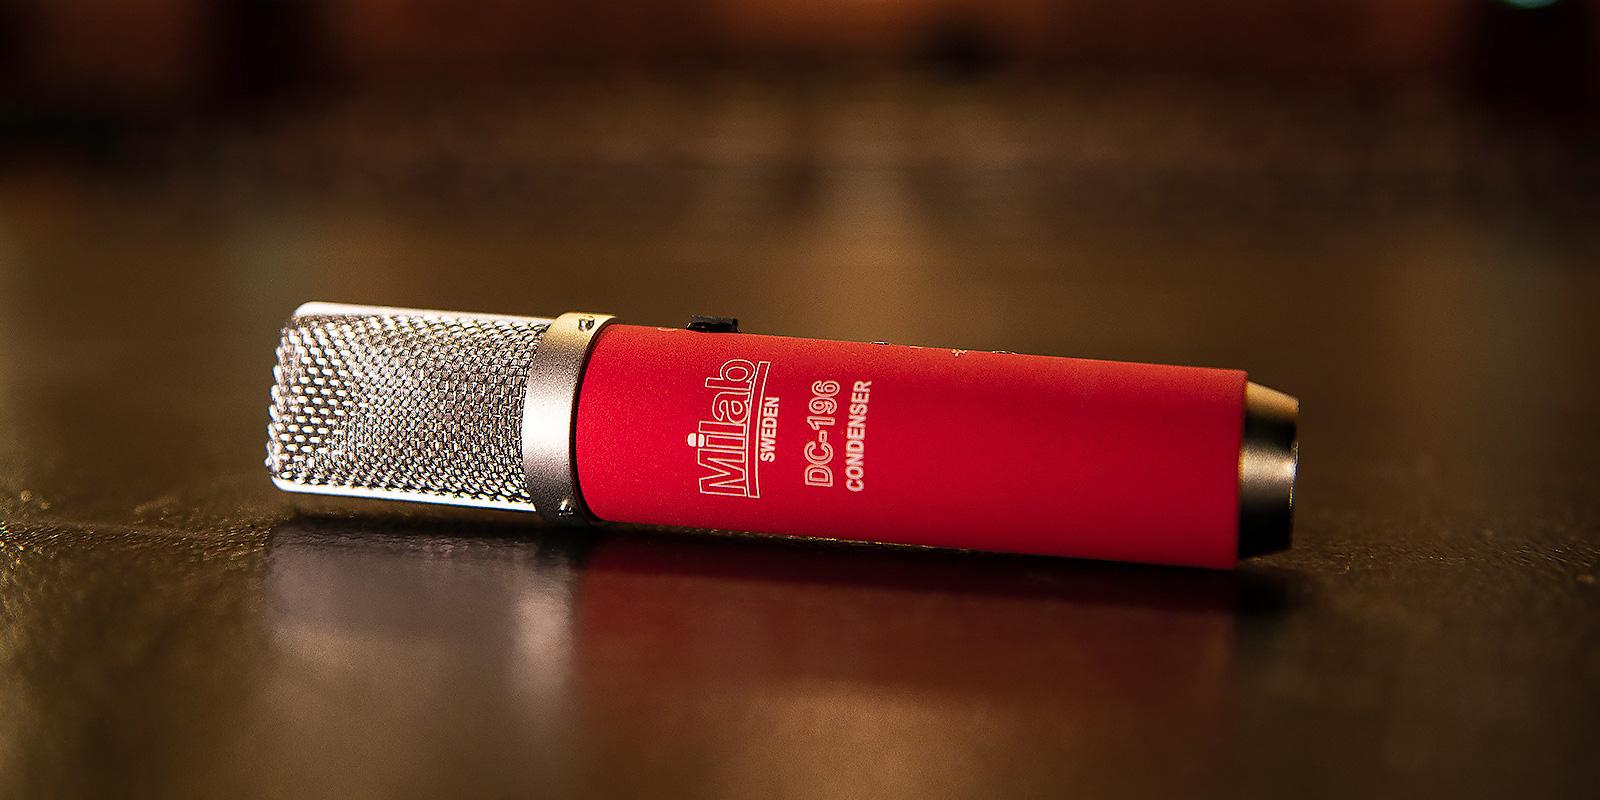 Milab DC-196 Condenser Microphone